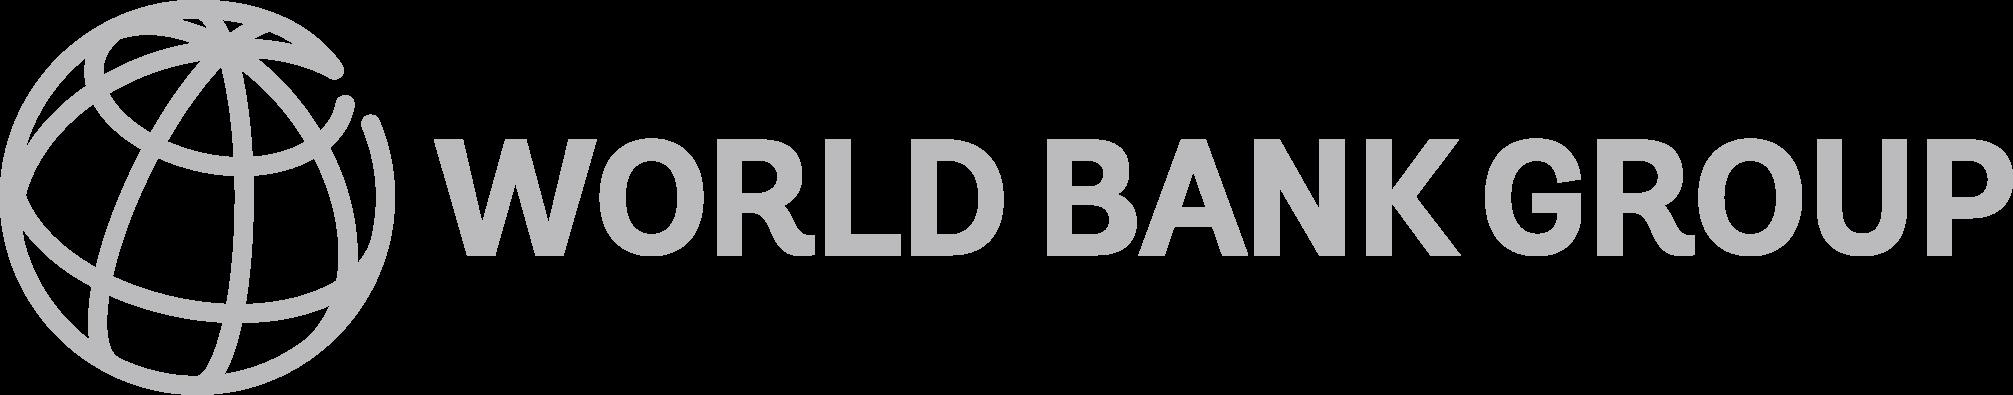 World Bank Group G